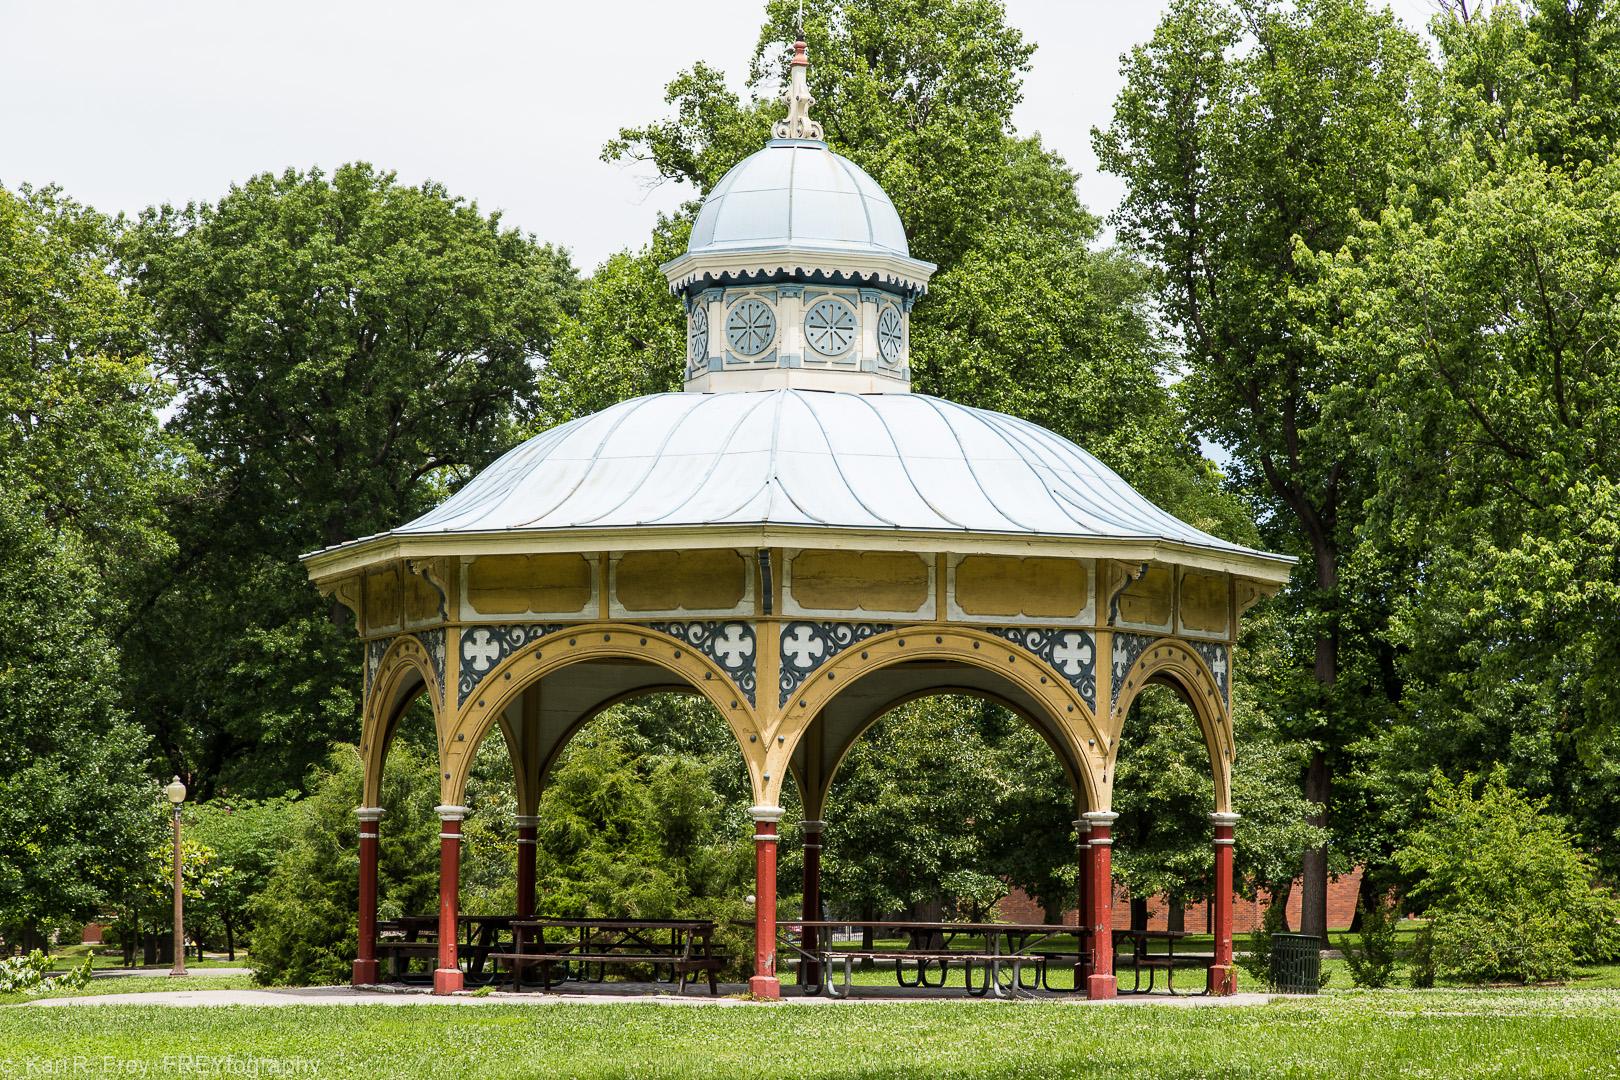 Old Playground Pavilion